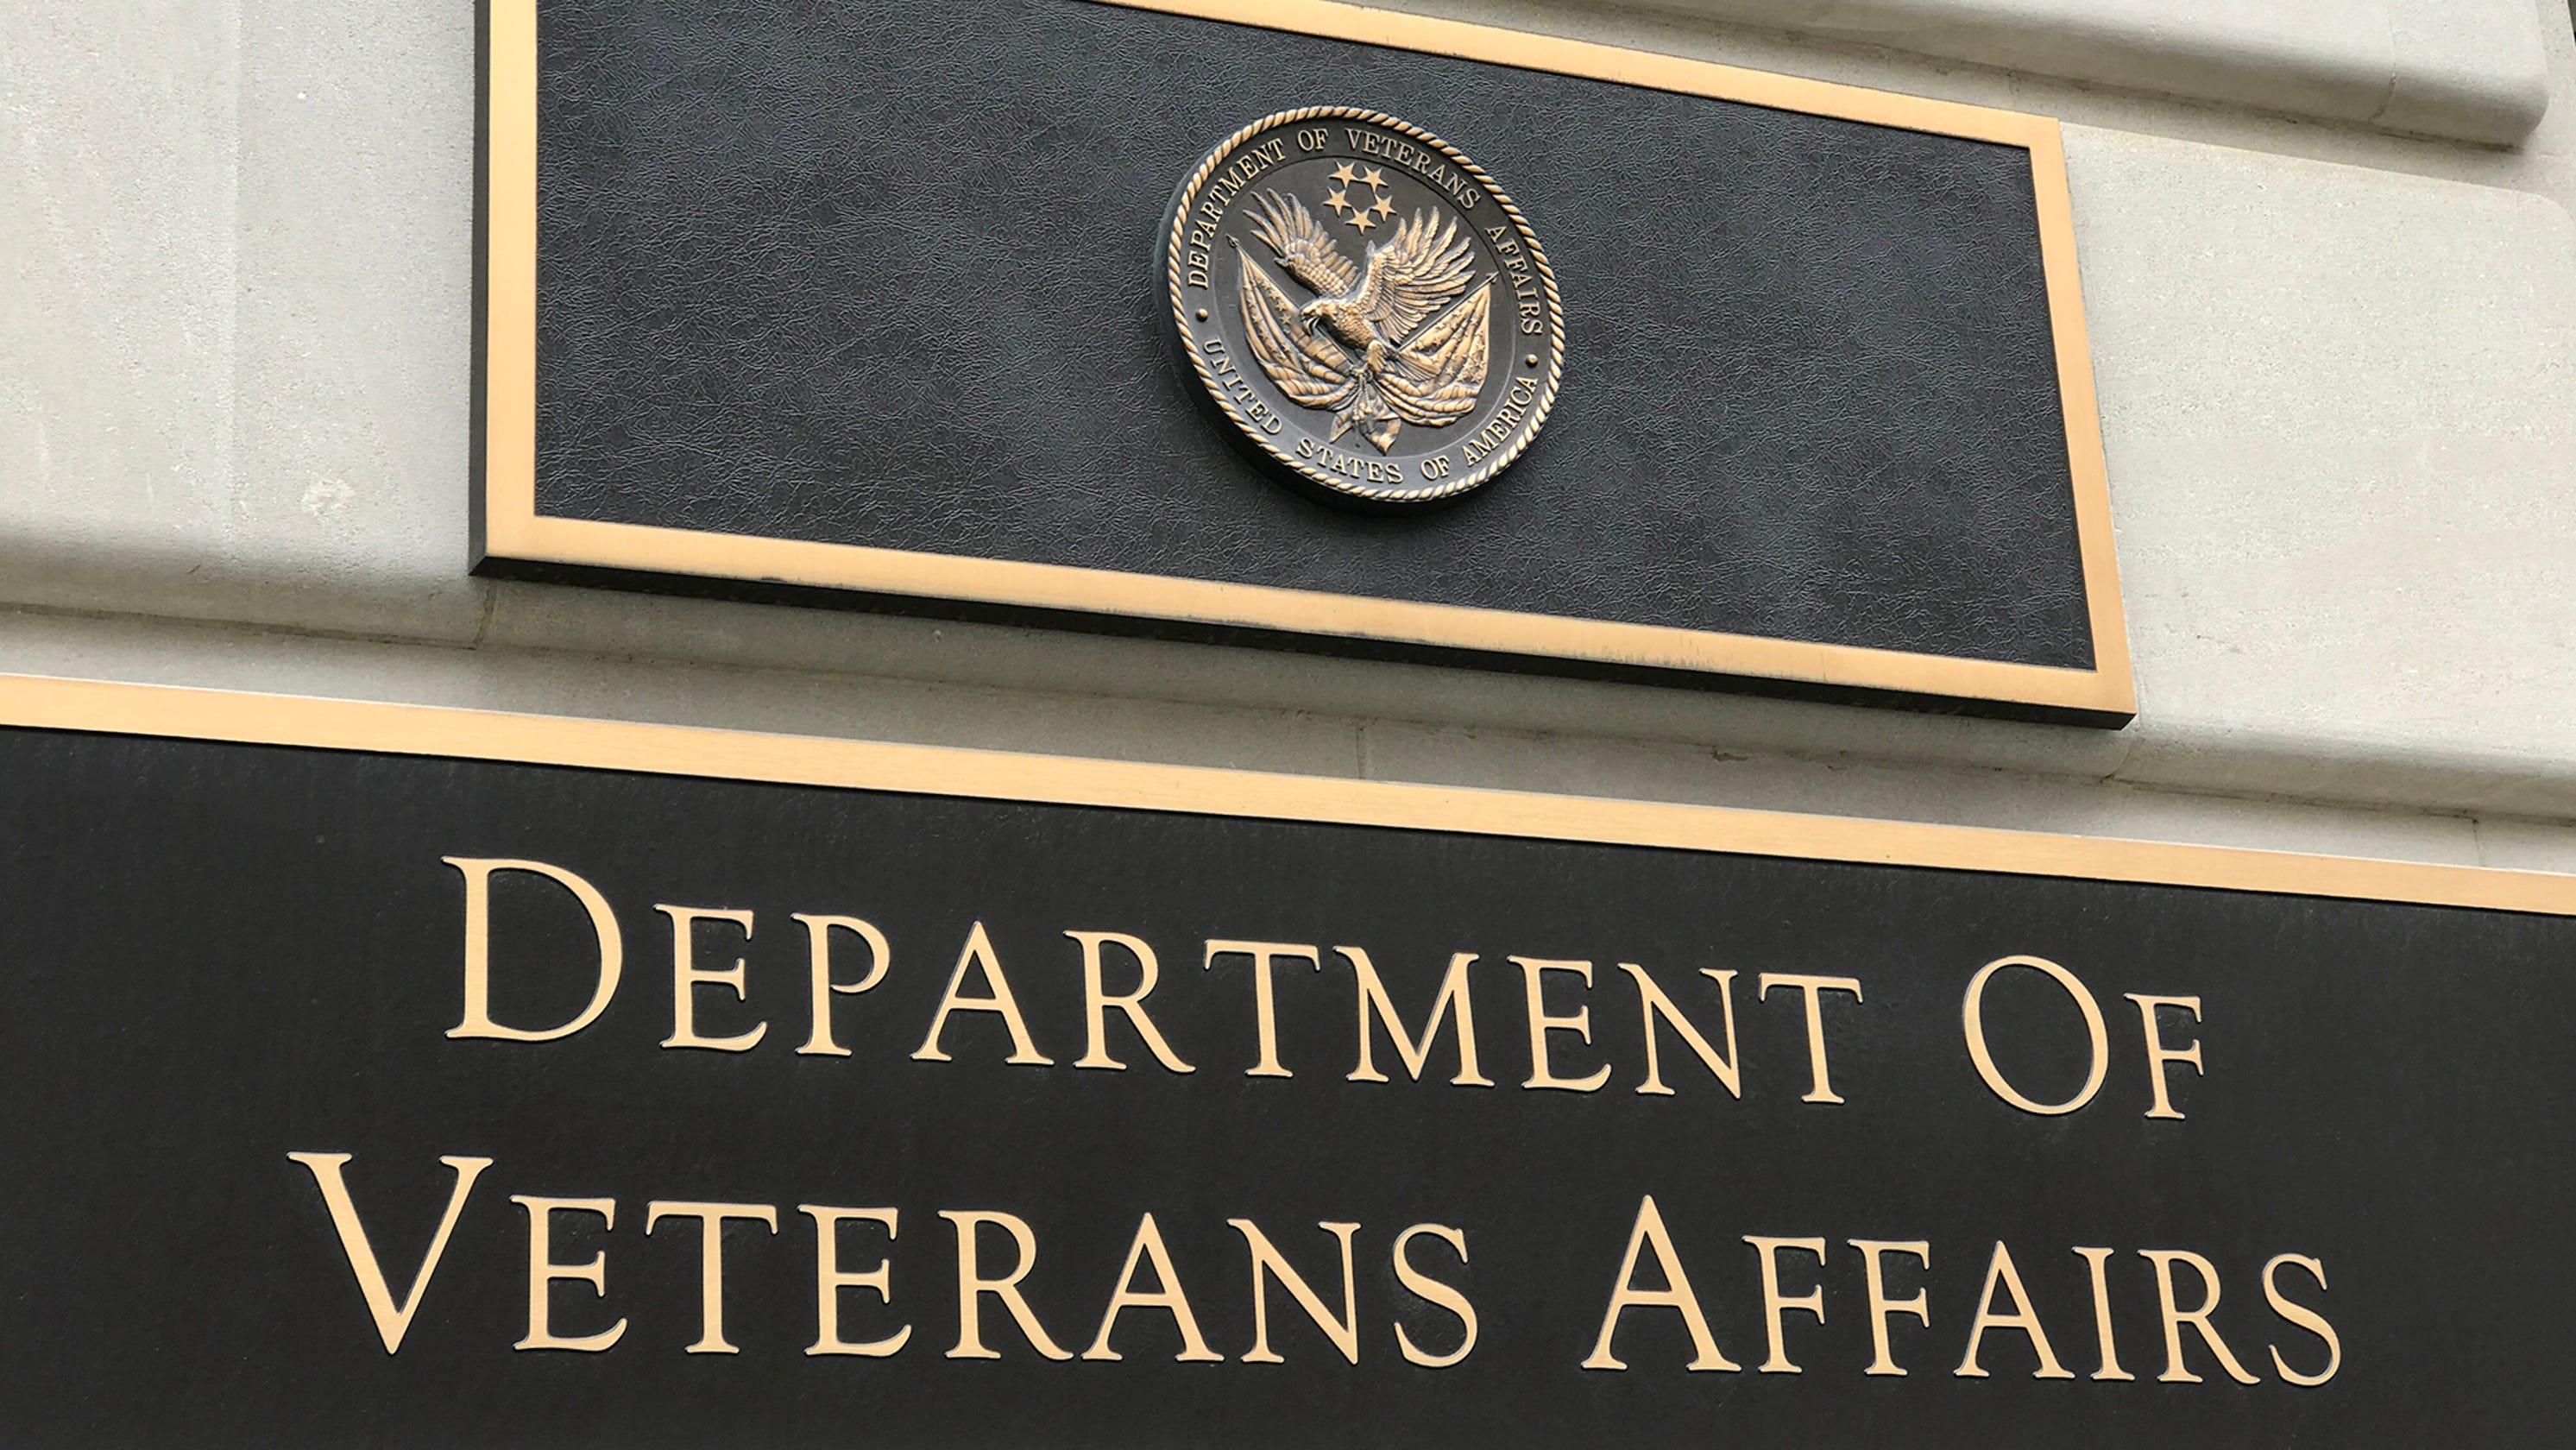 Biloxi VA hospital found in violation of federal policies